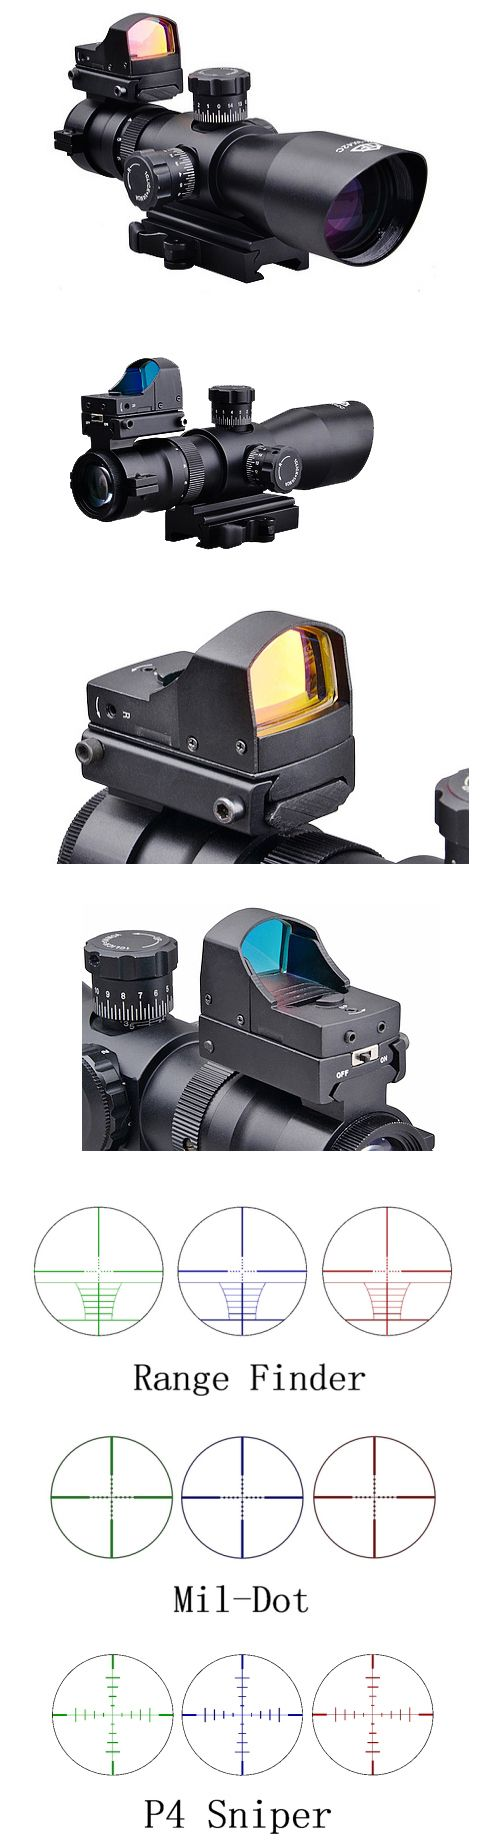 Trinity 39x42 Tactical Qd Scope + Backup Red Dot Sight Trinity 39x42